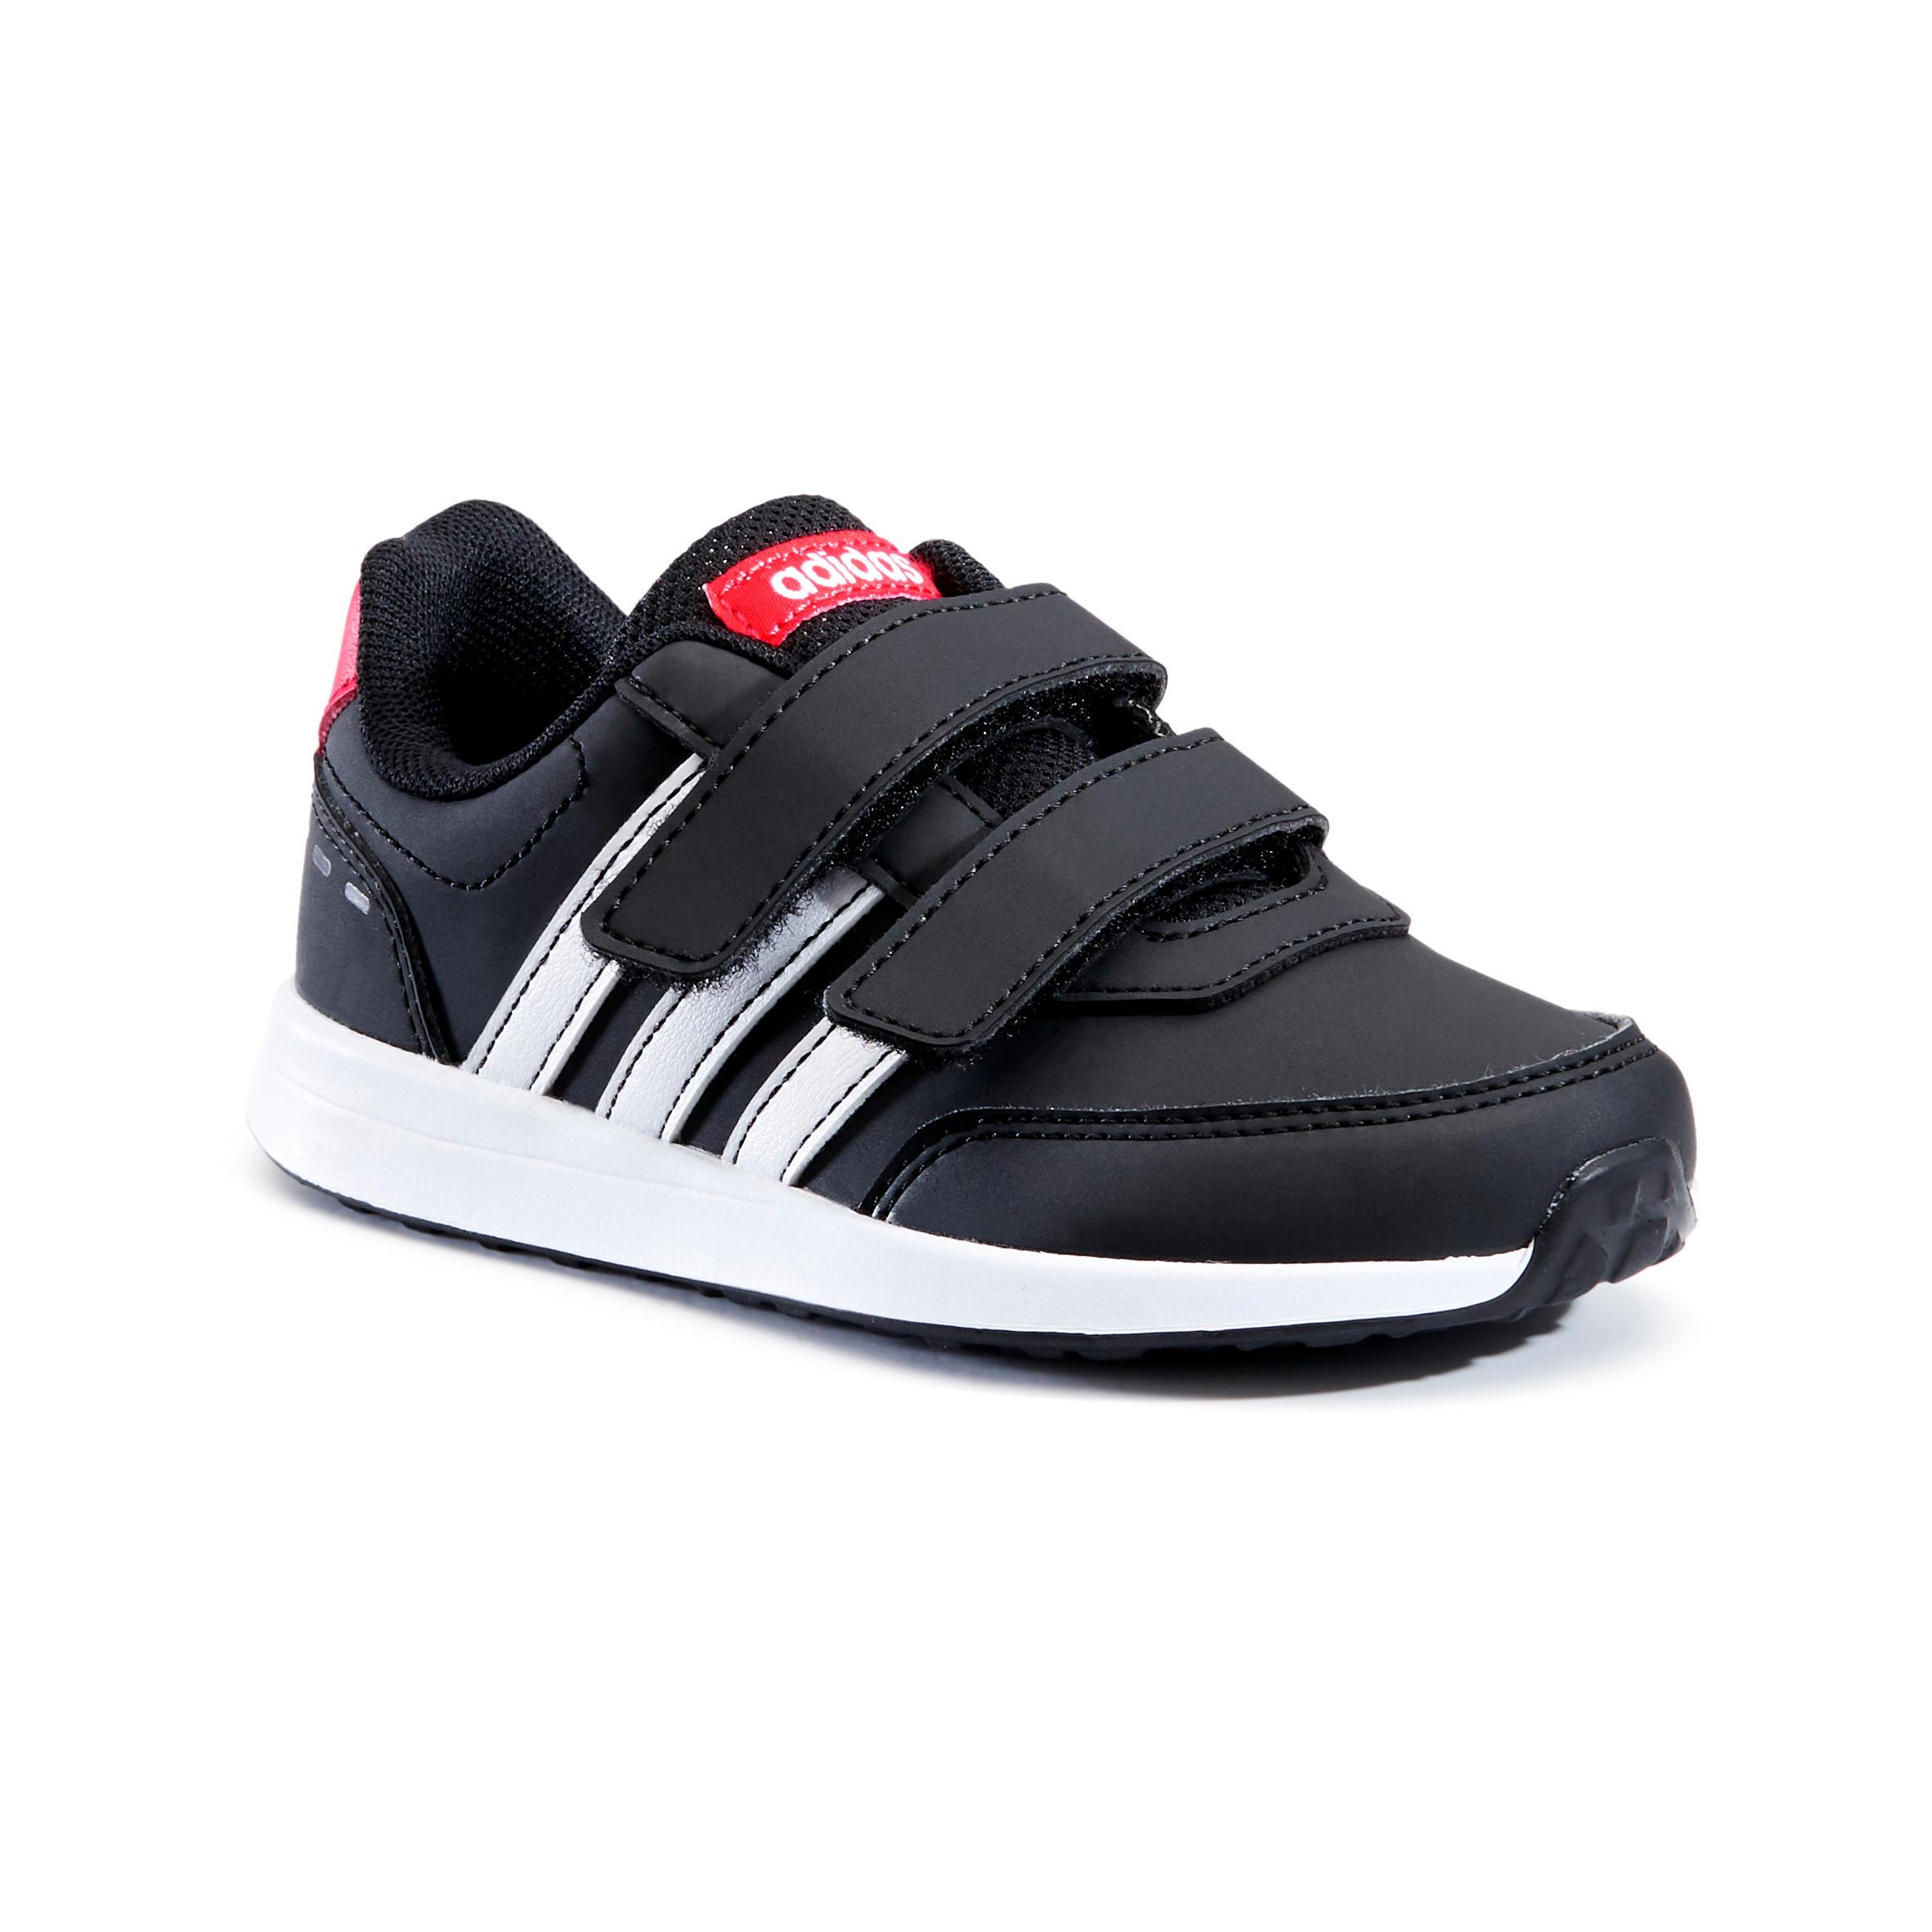 scarpe adidas uomo con velcro